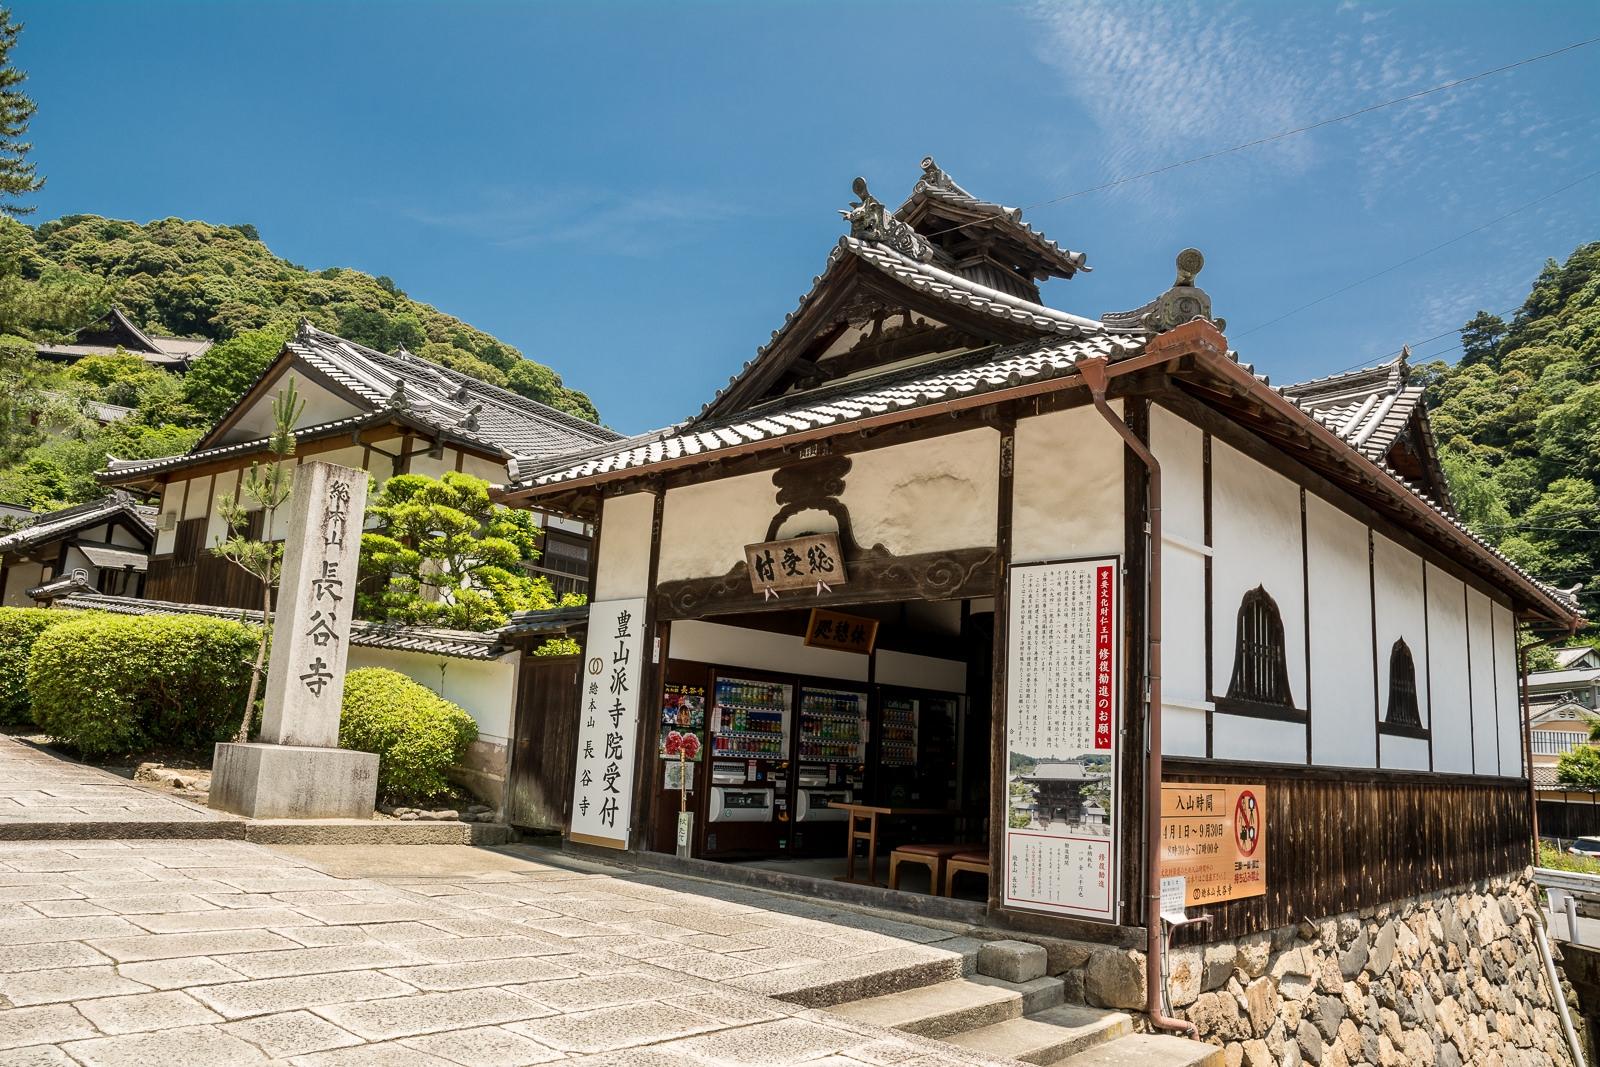 Souketsuke, Hasedera, Nara